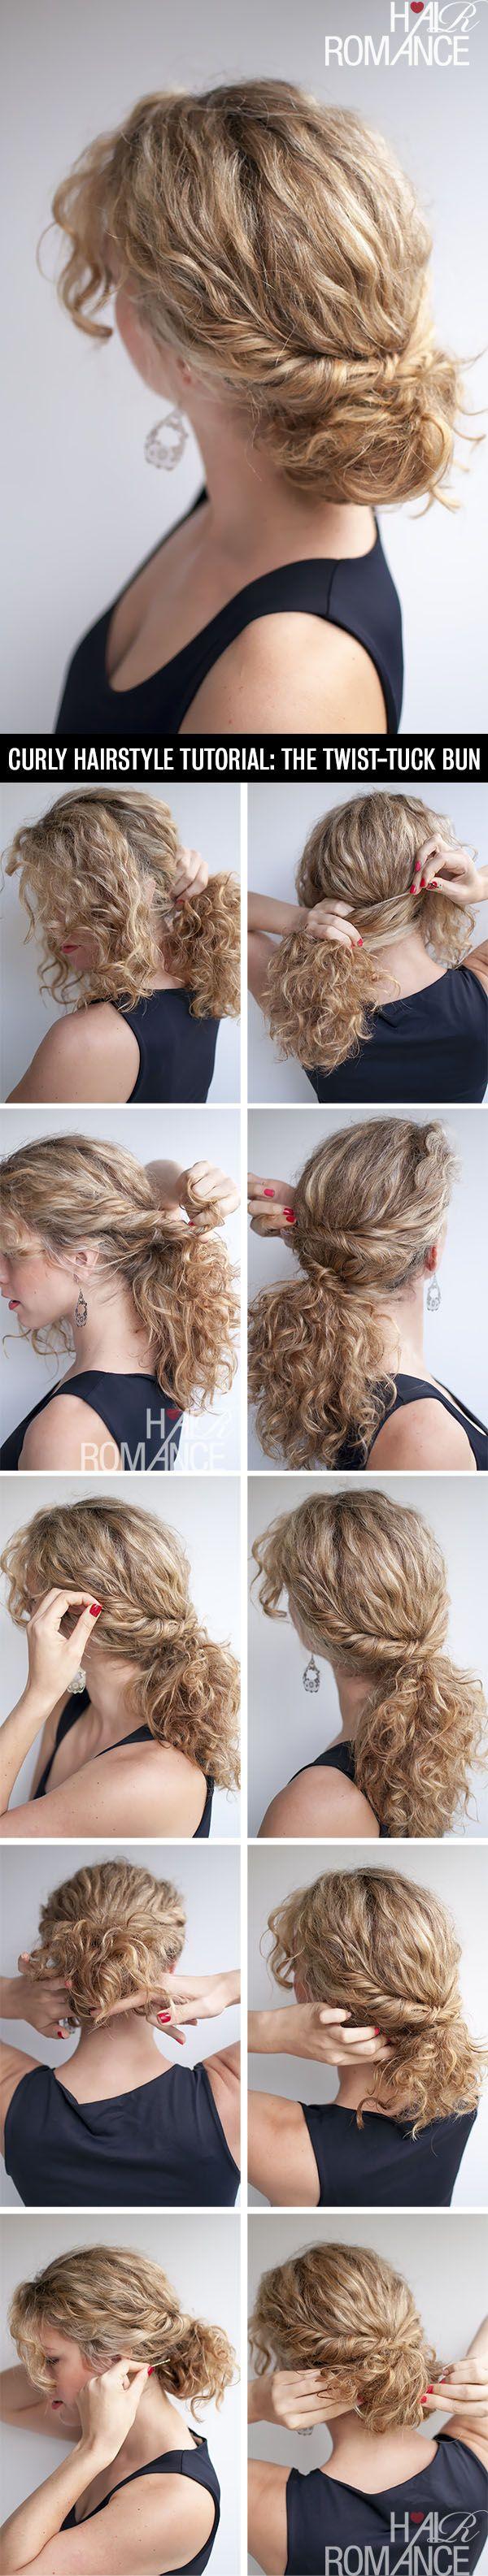 hair romance - curly hairstyle tutorial - the twist-tuck bun